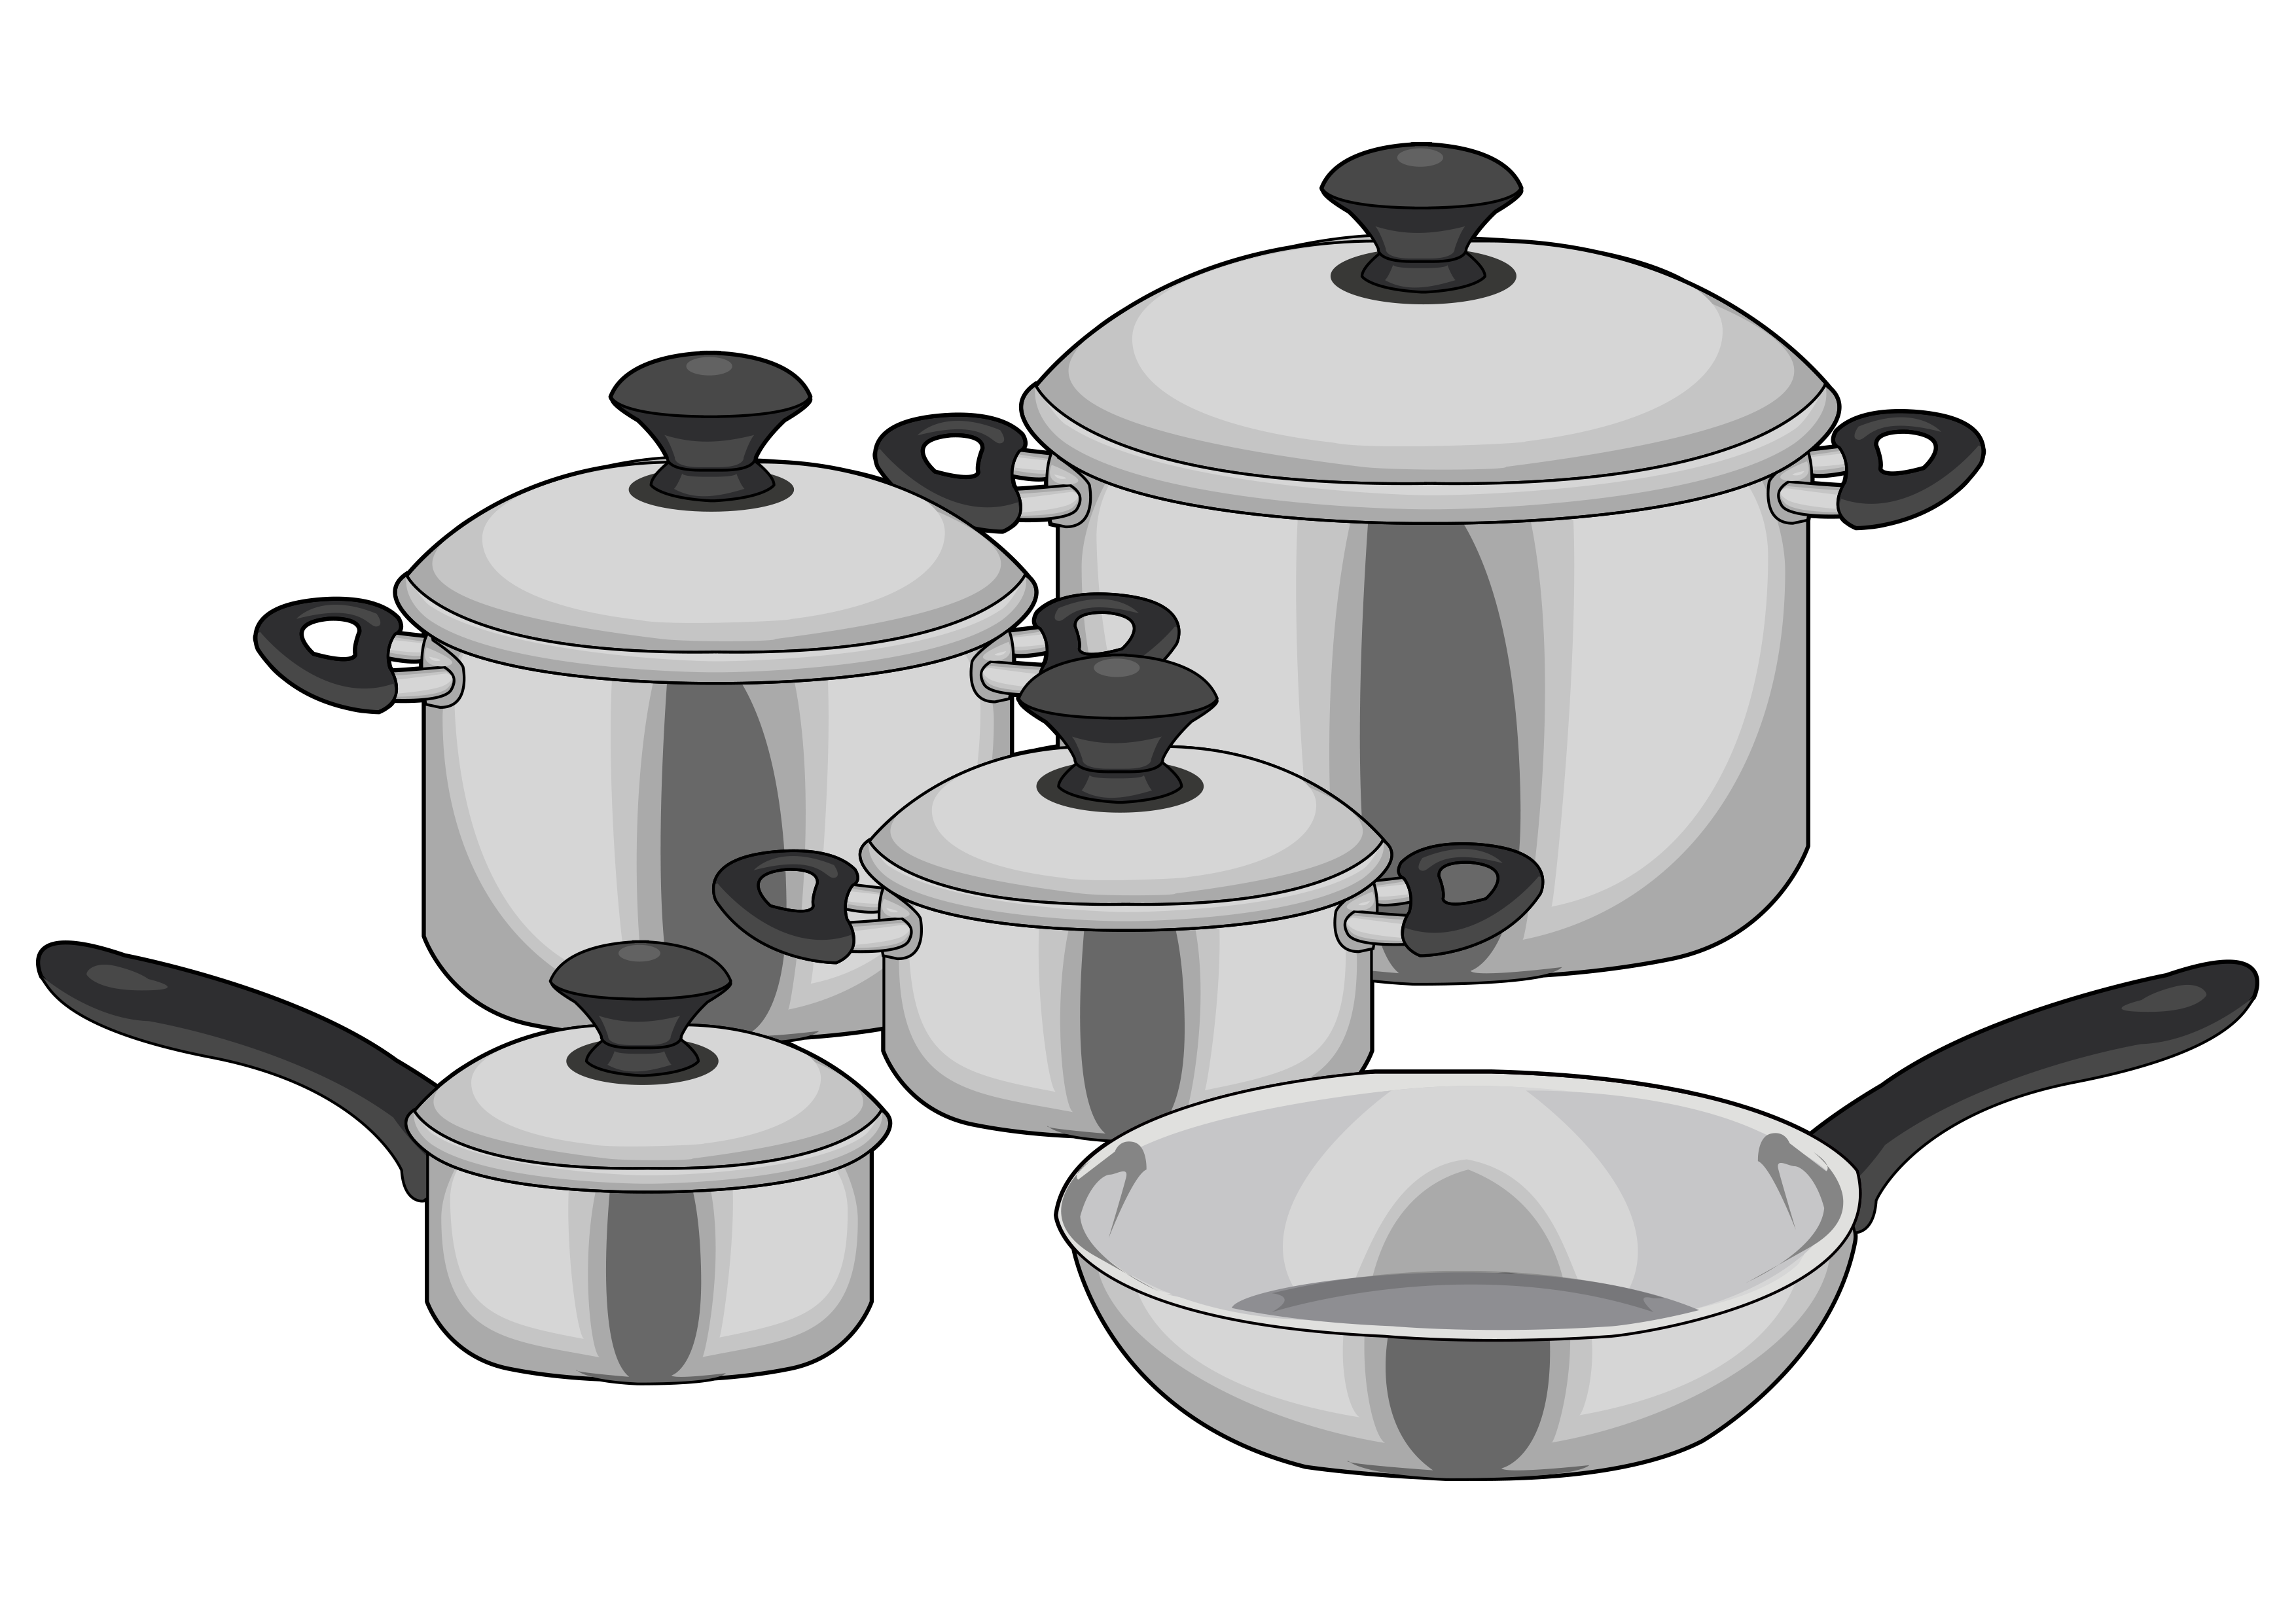 Cocina dibujo cocina para colorear dibujo de cocinas with for Dibujos de cocina